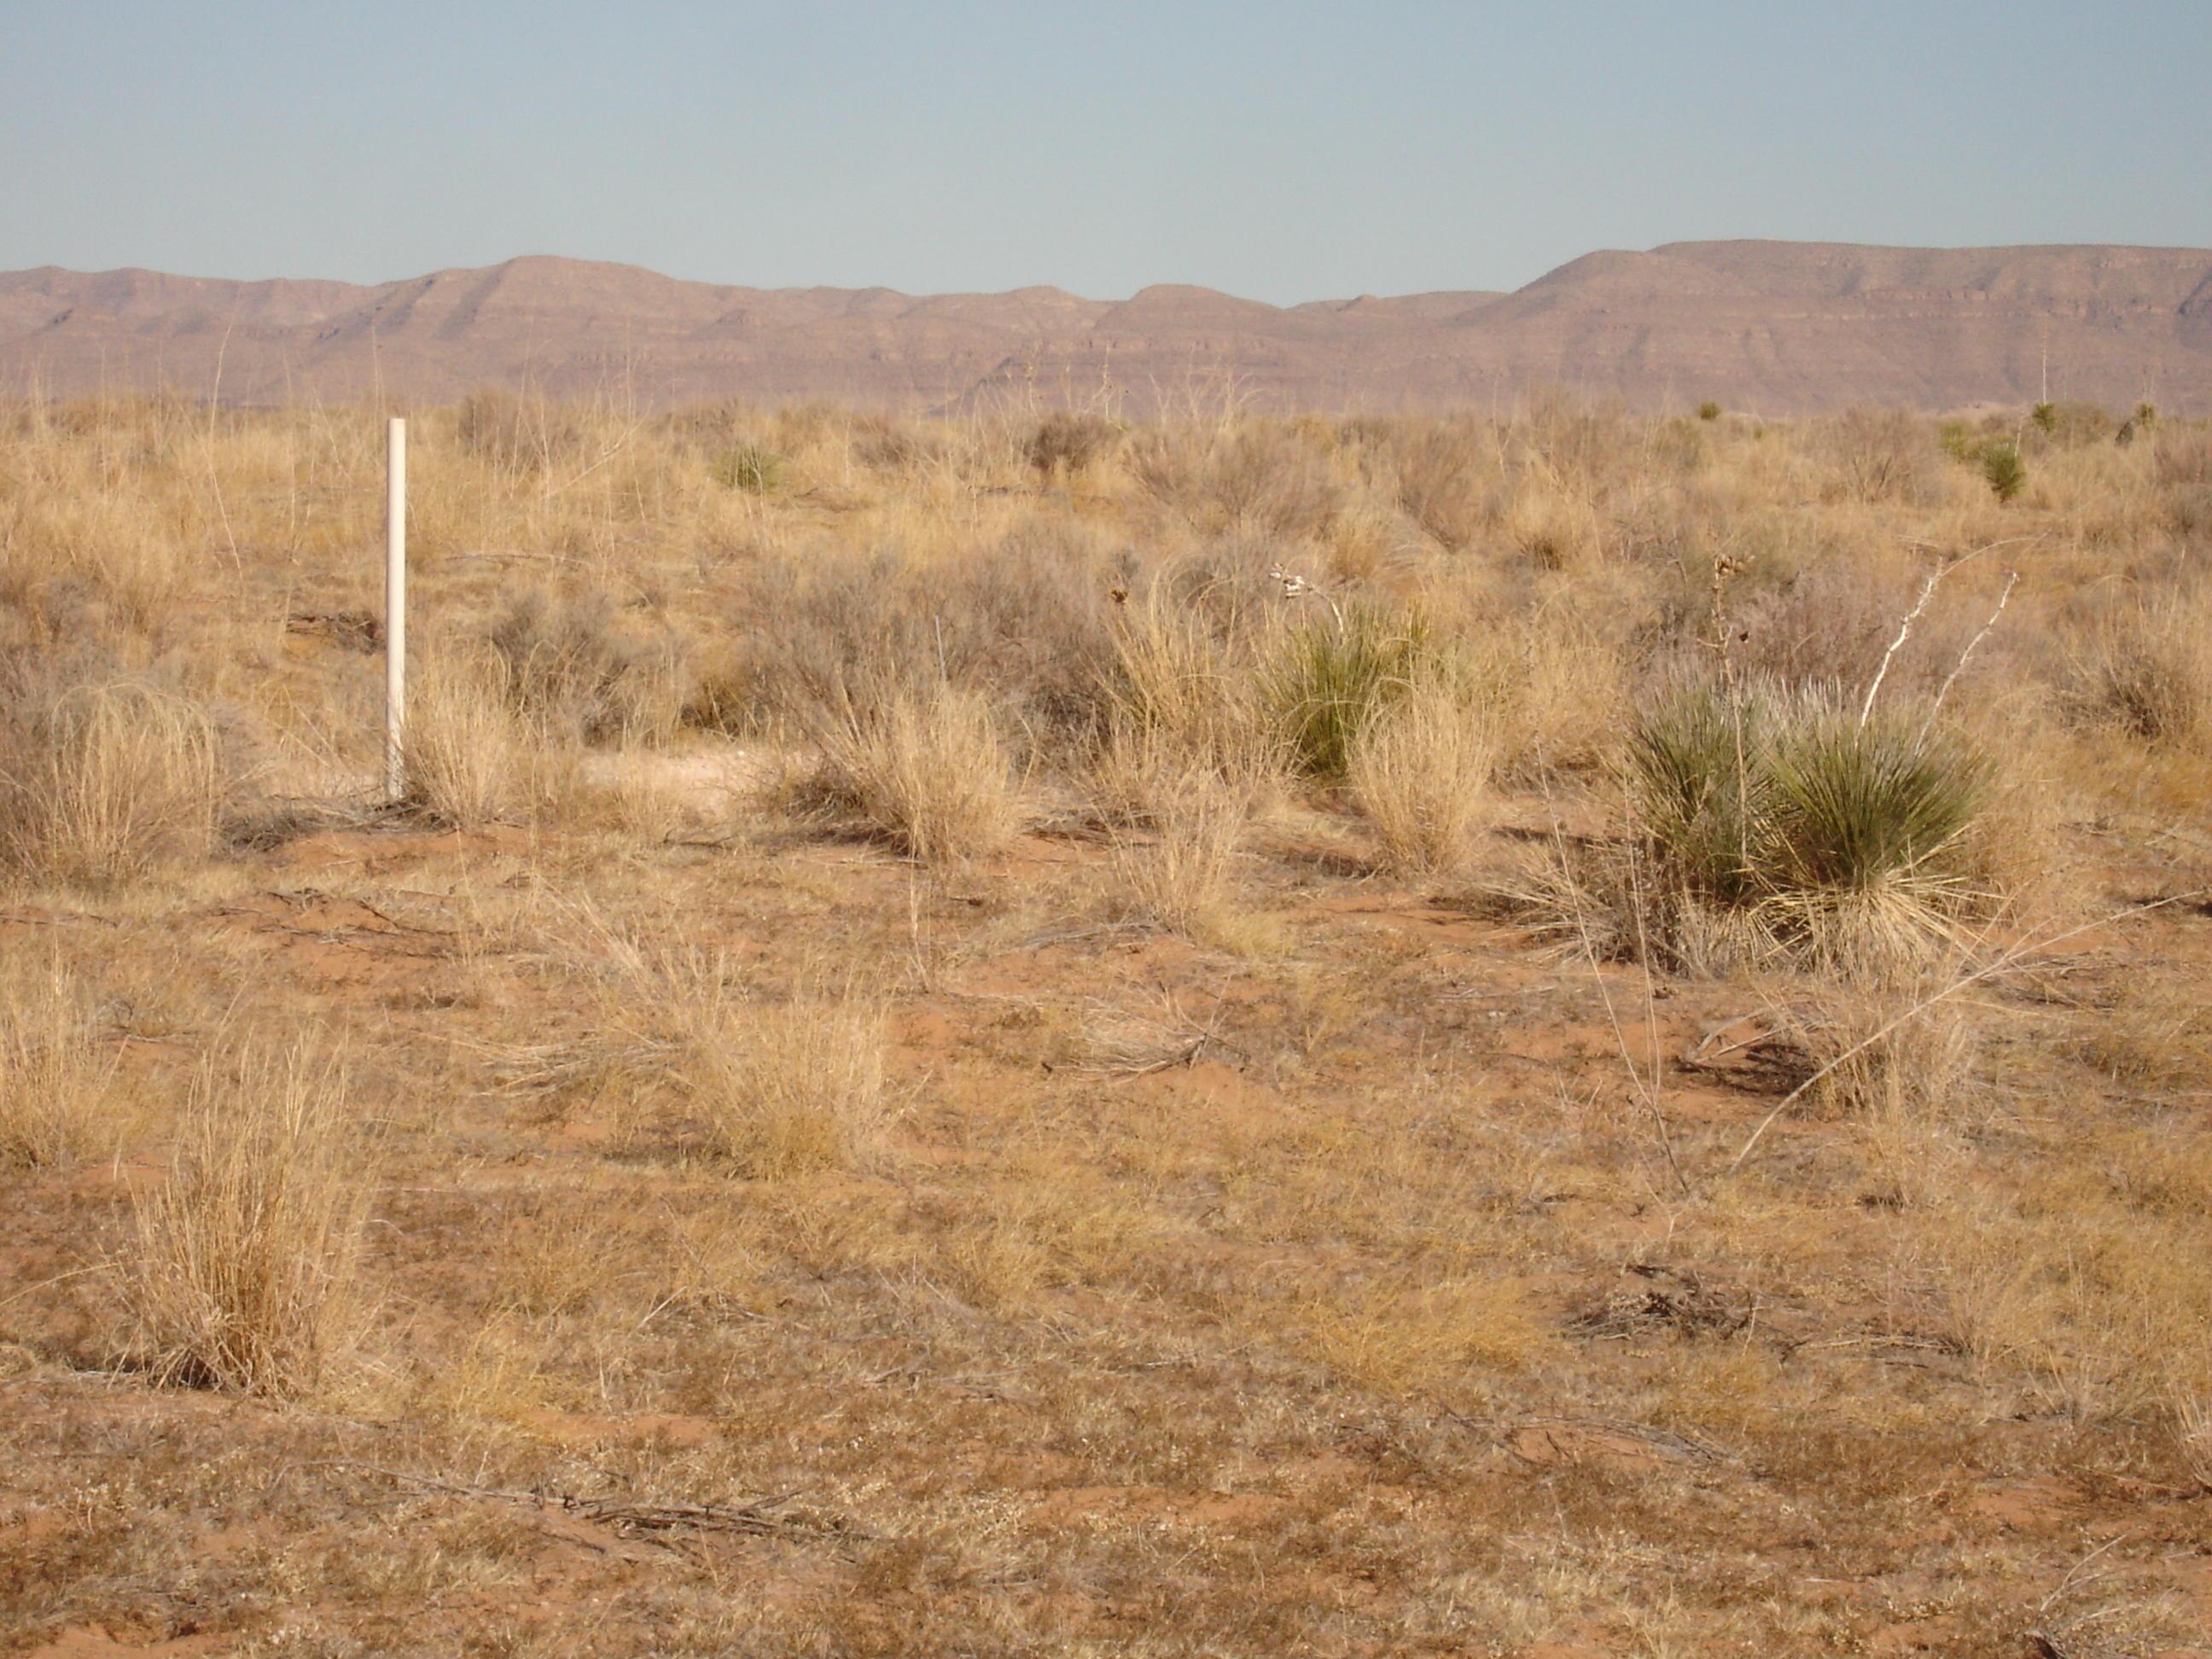 0 State Highway 1111, Sierra Blanca, Texas 79851, ,Land,For sale,State Highway 1111,807284